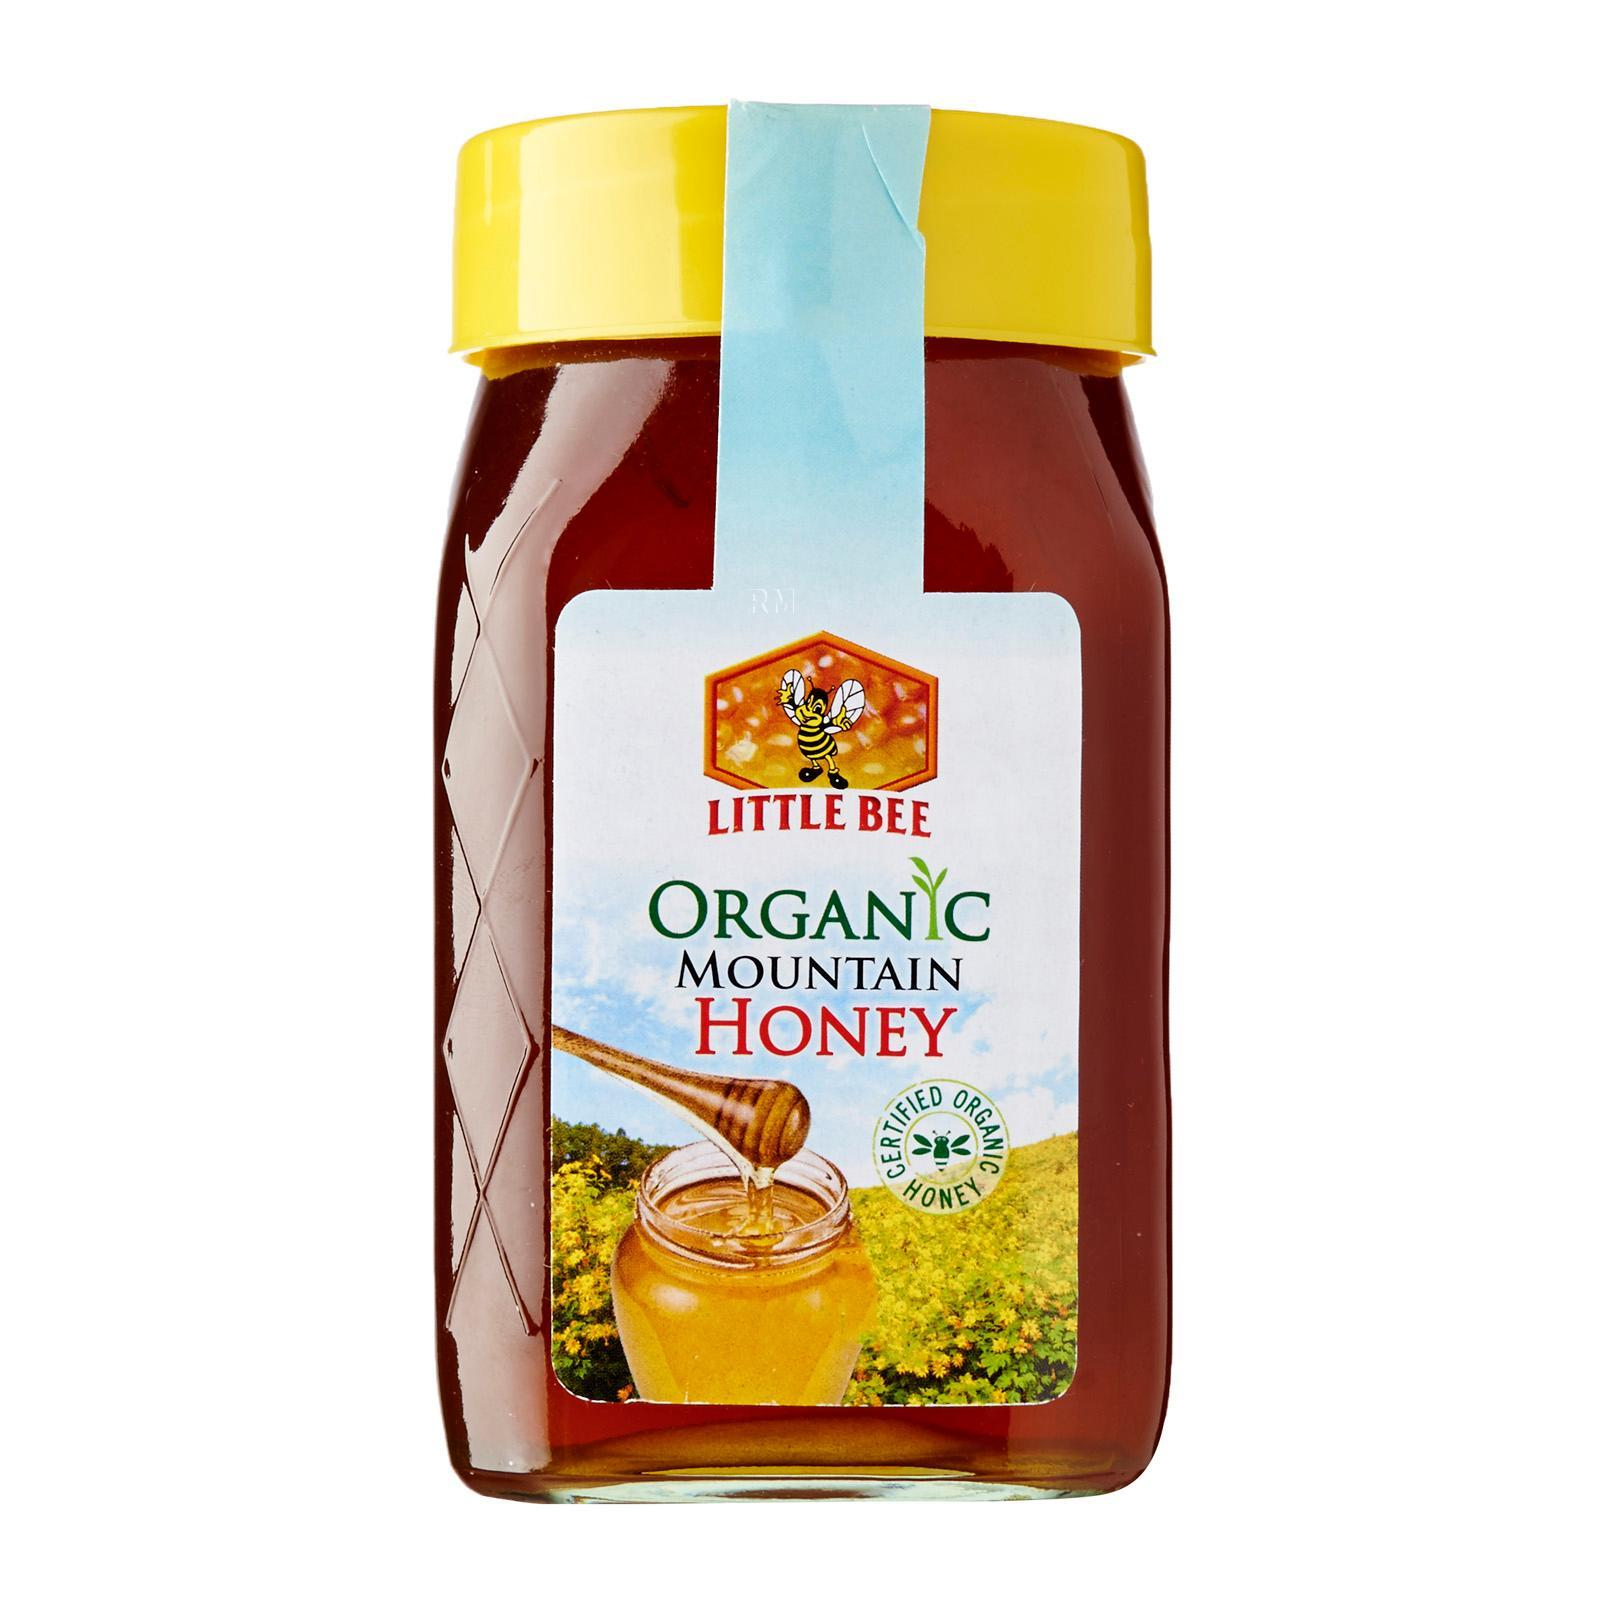 Little Bee Certified Organic Mountain Wild Honey